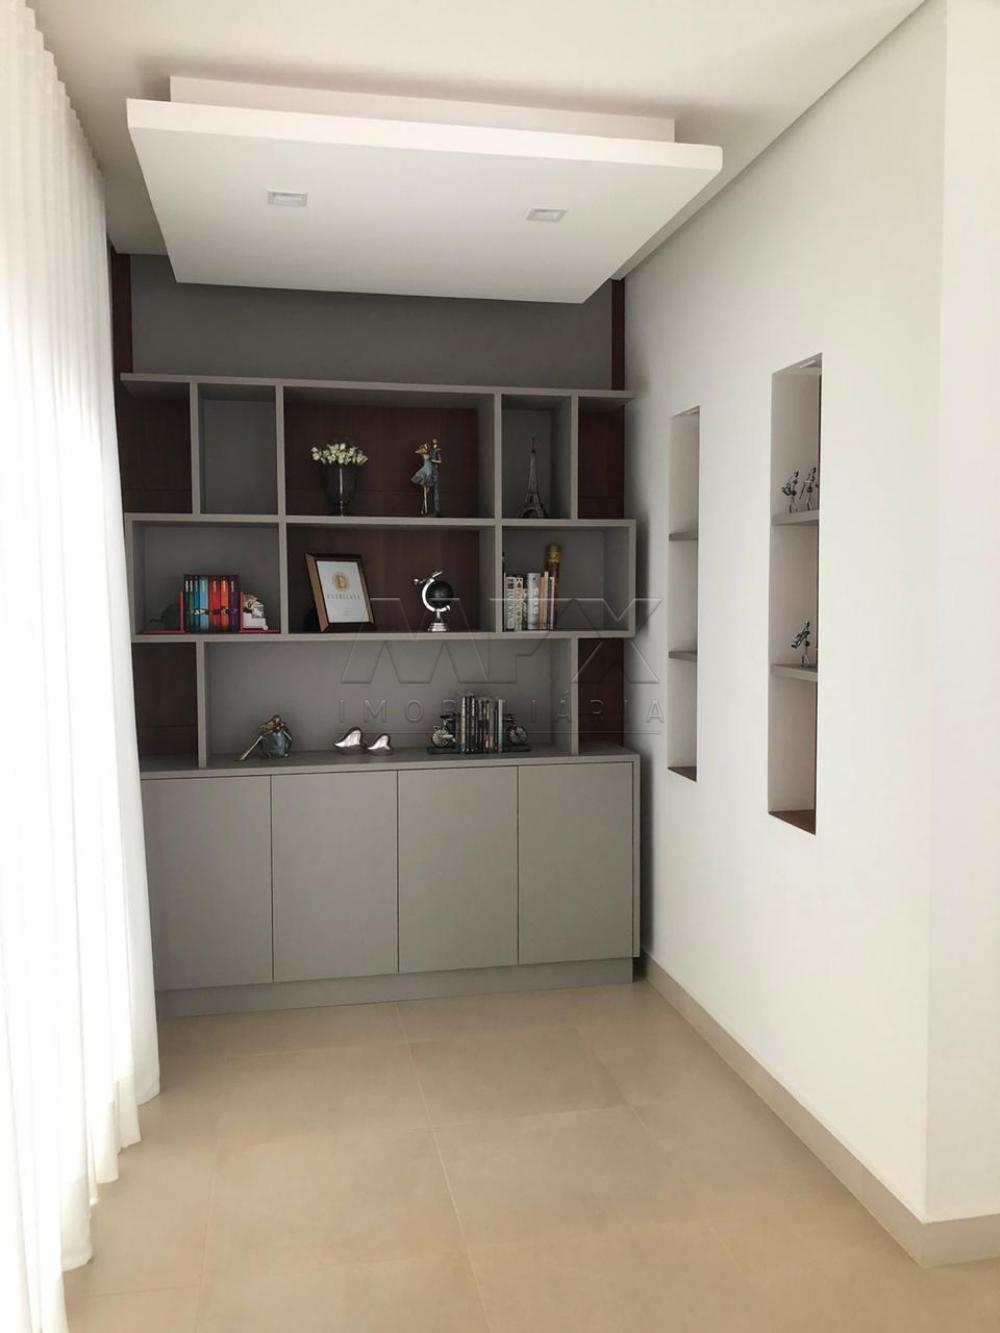 Alugar Casa / Condomínio em Bauru apenas R$ 9.000,00 - Foto 10